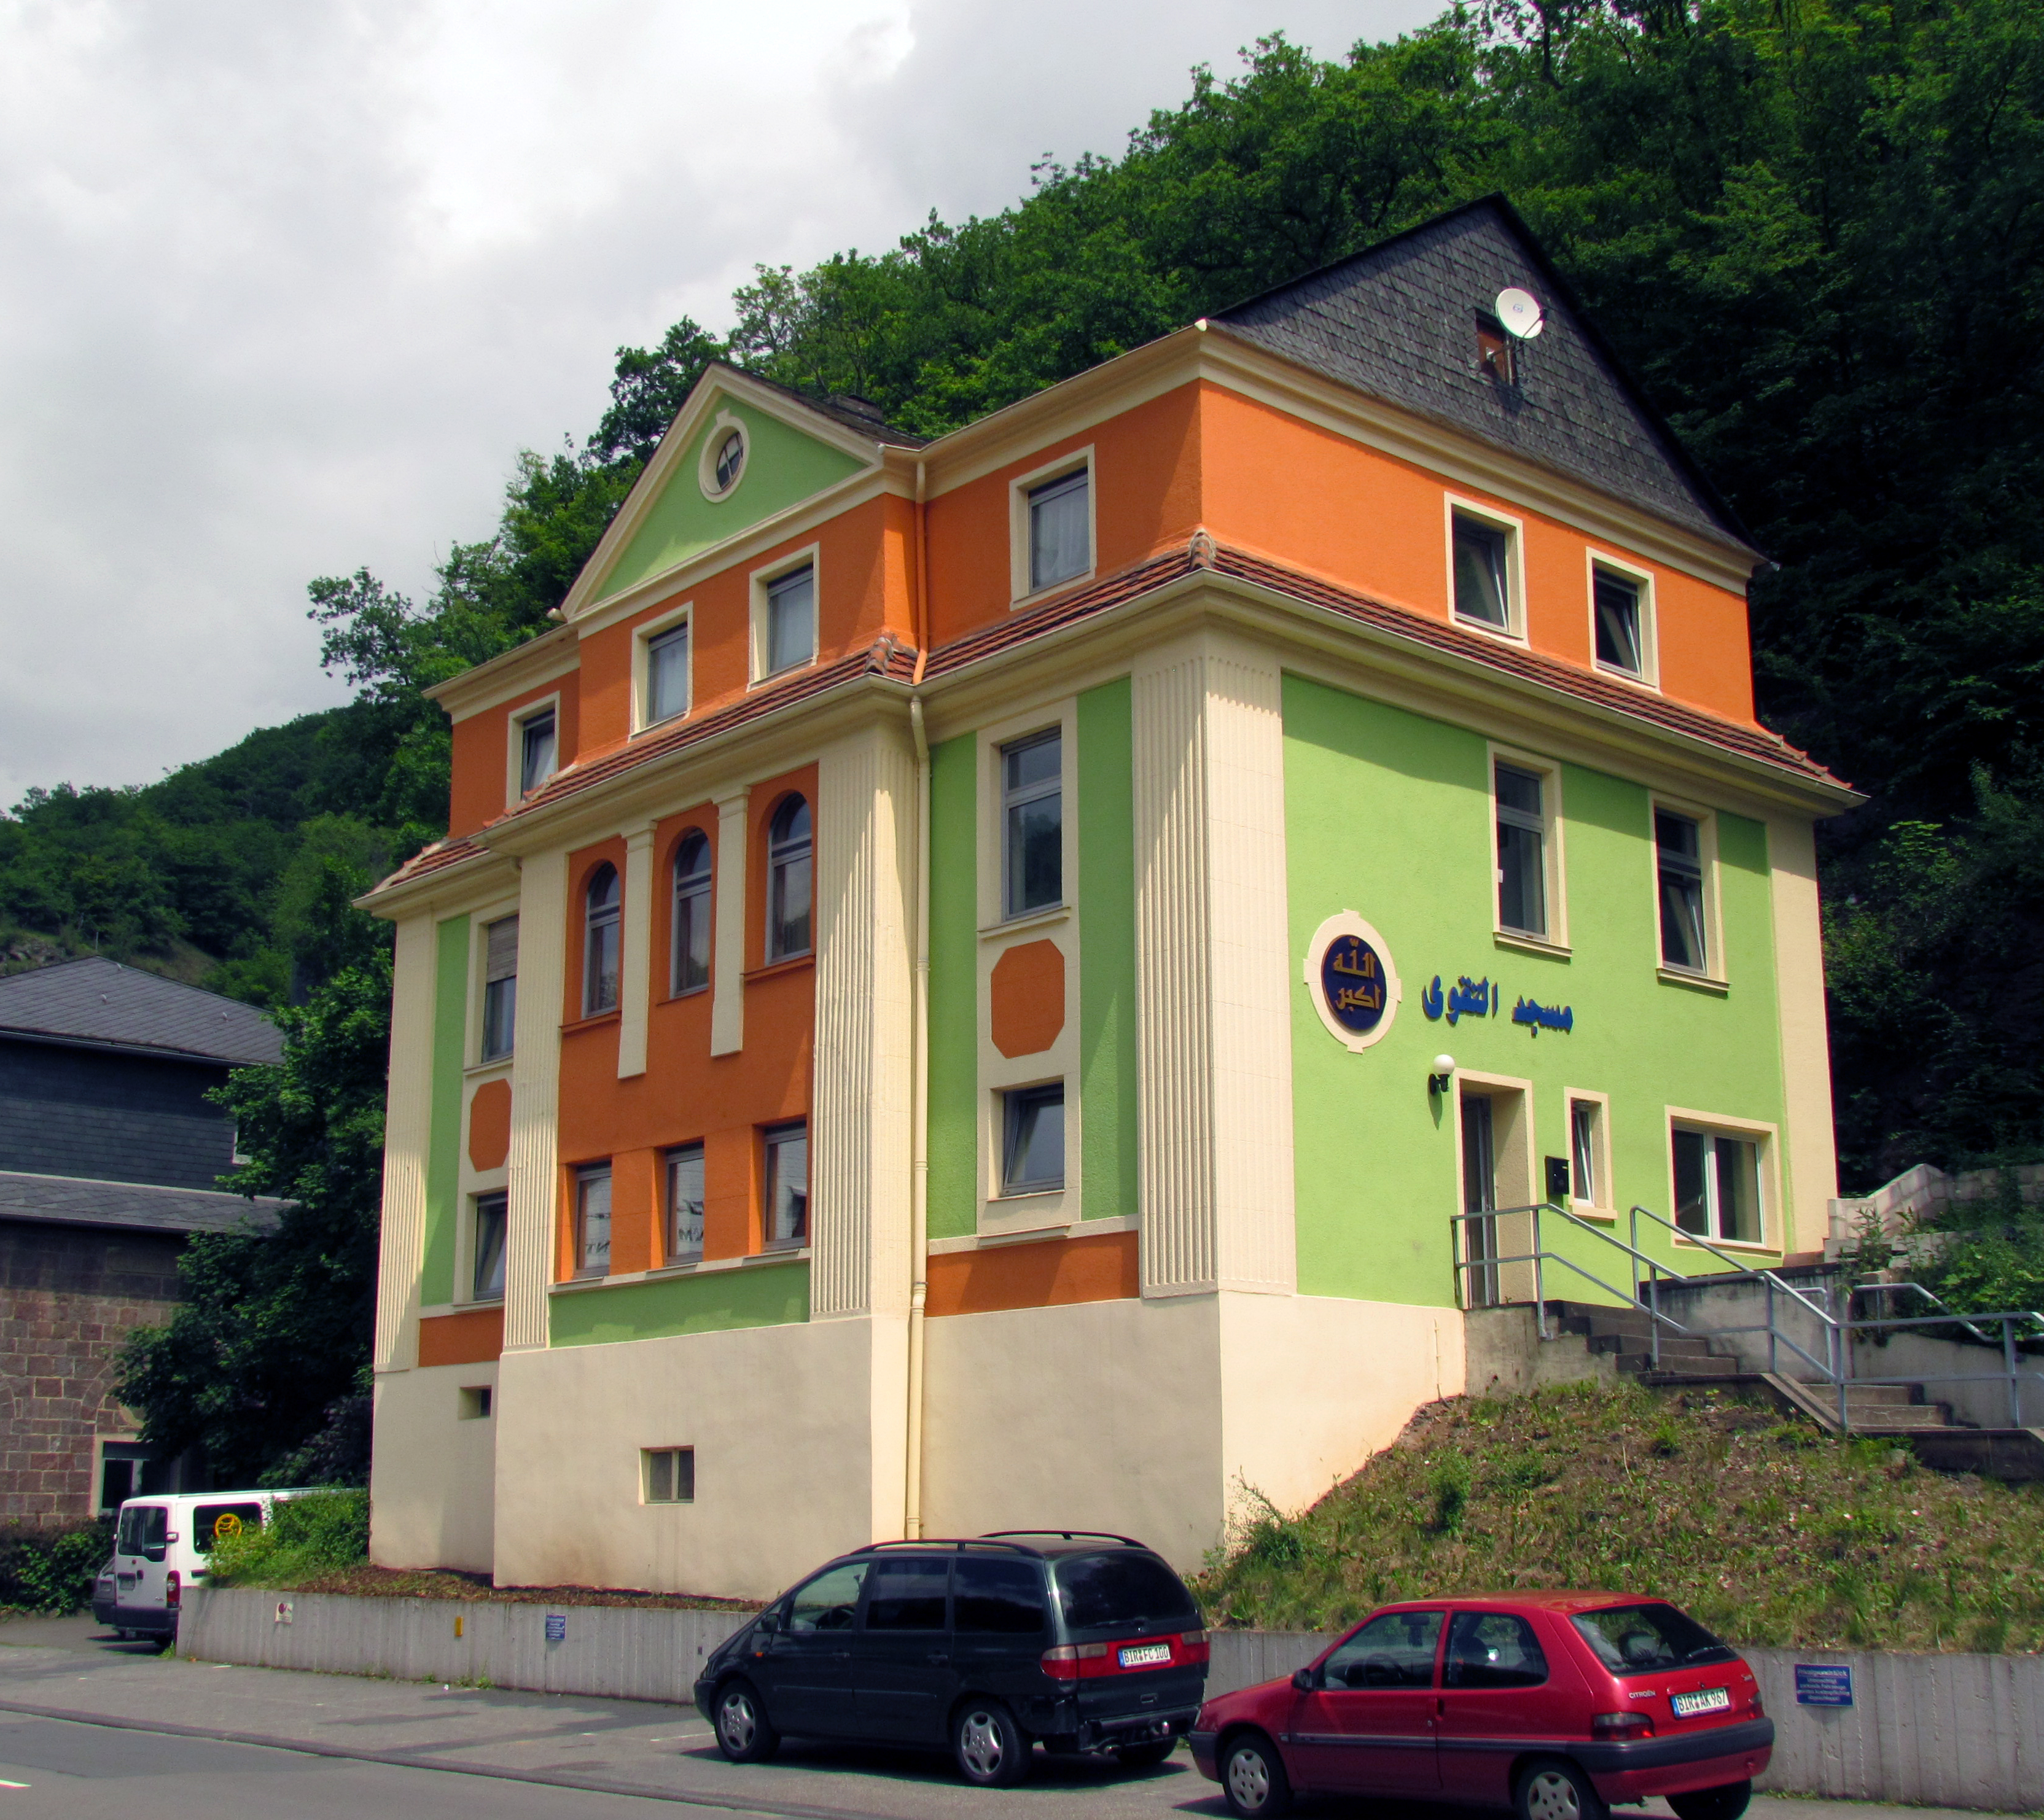 Datei Idar Oberstein Hauptstr Buntes Haus fcm